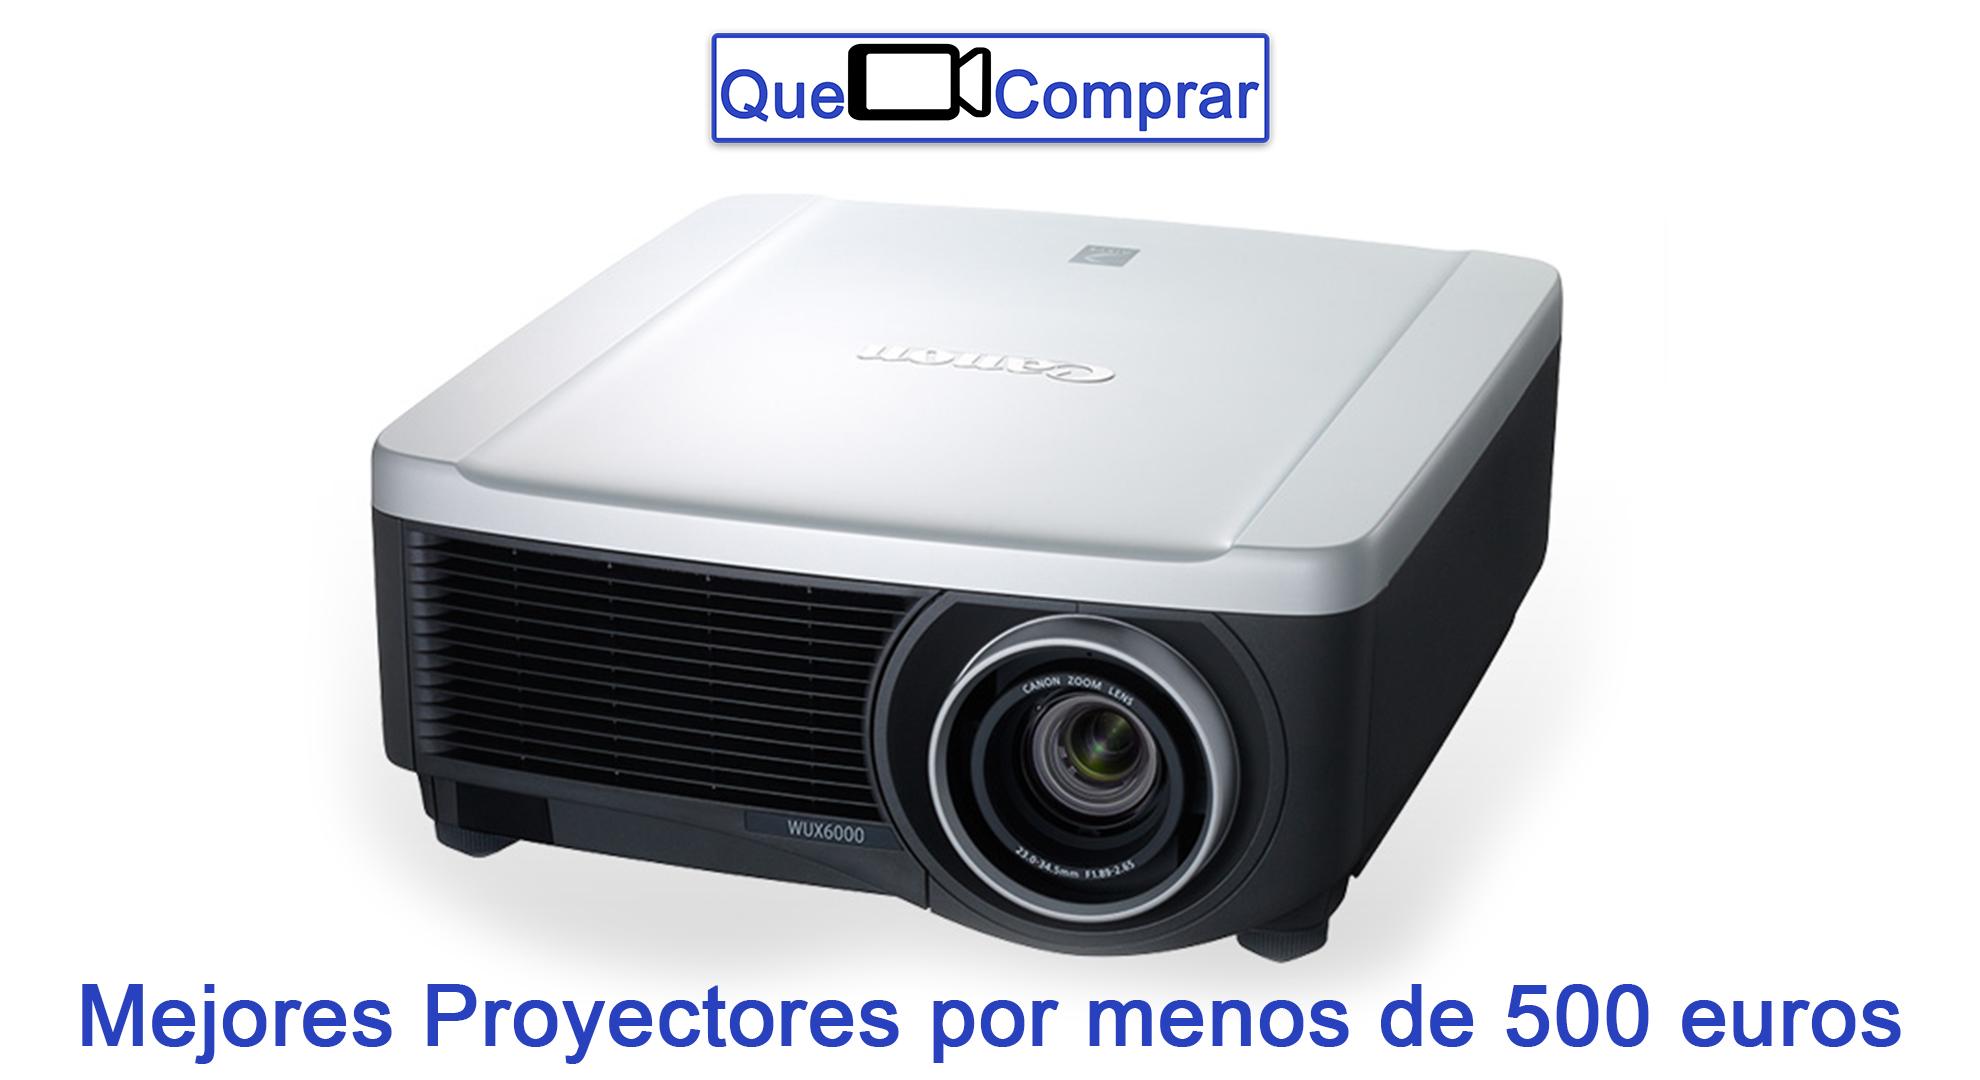 Mejores Proyectores por menos de 500 euros